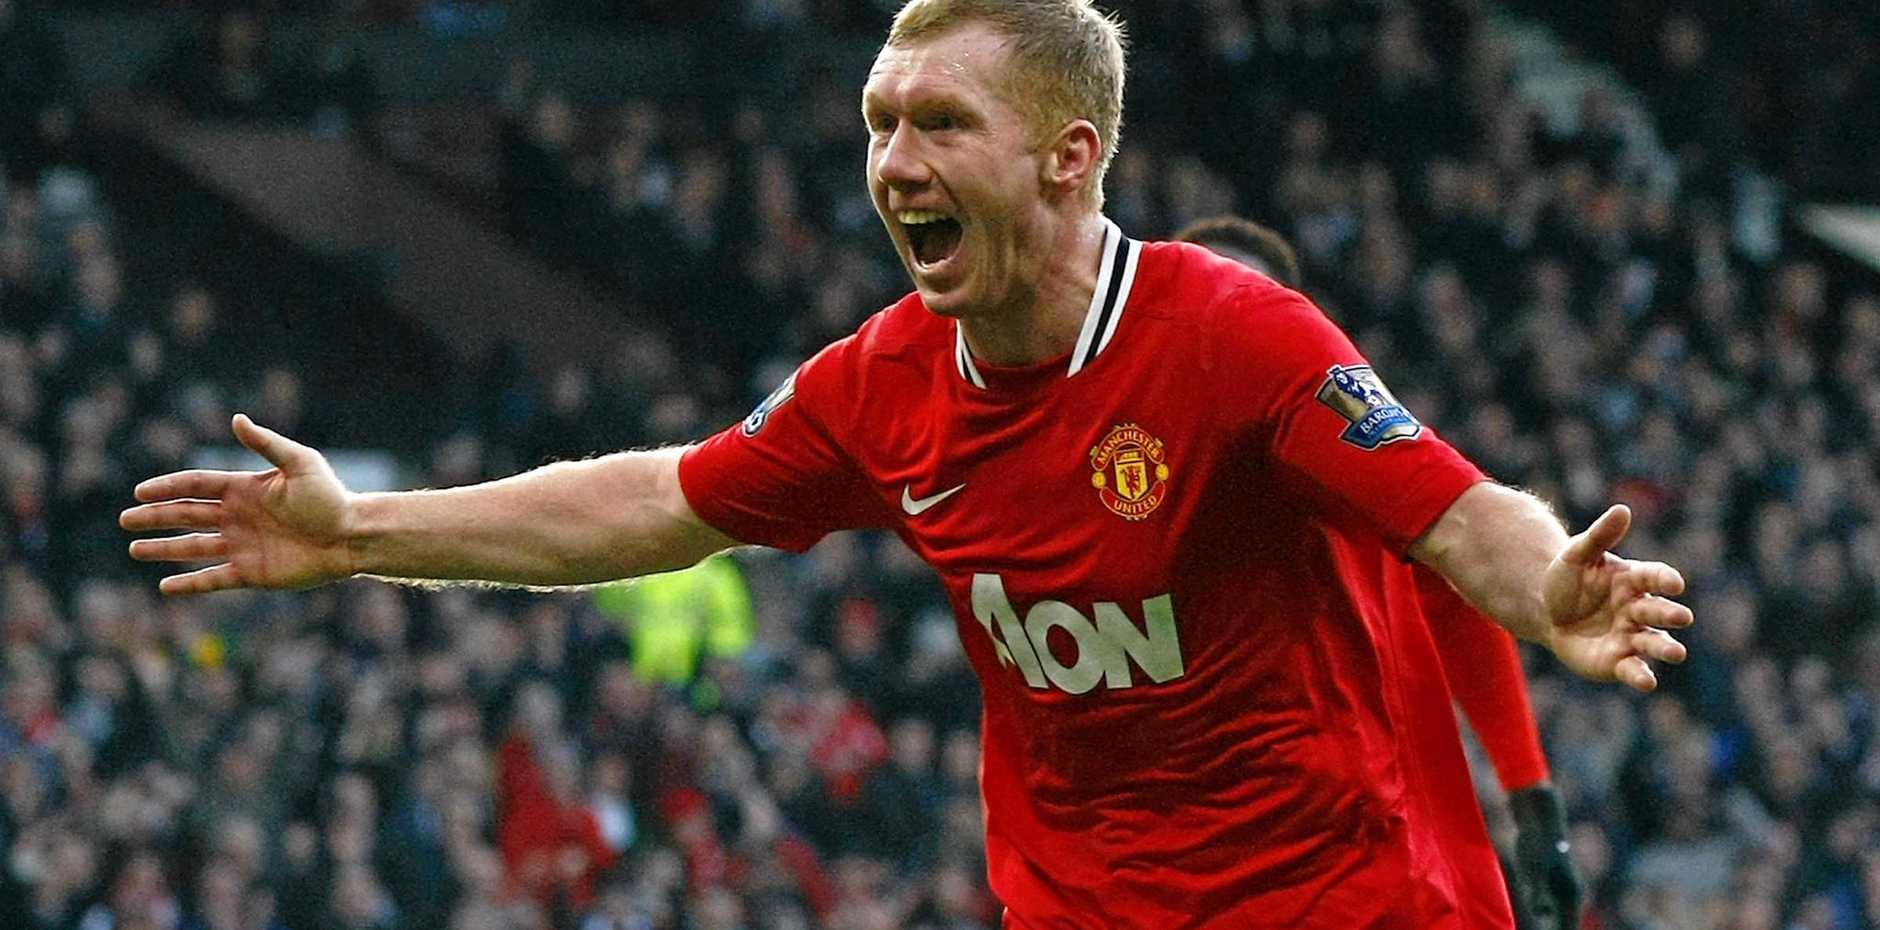 Manchester United's Paul Scholes celebrates scoring a goal in the English Premier League.